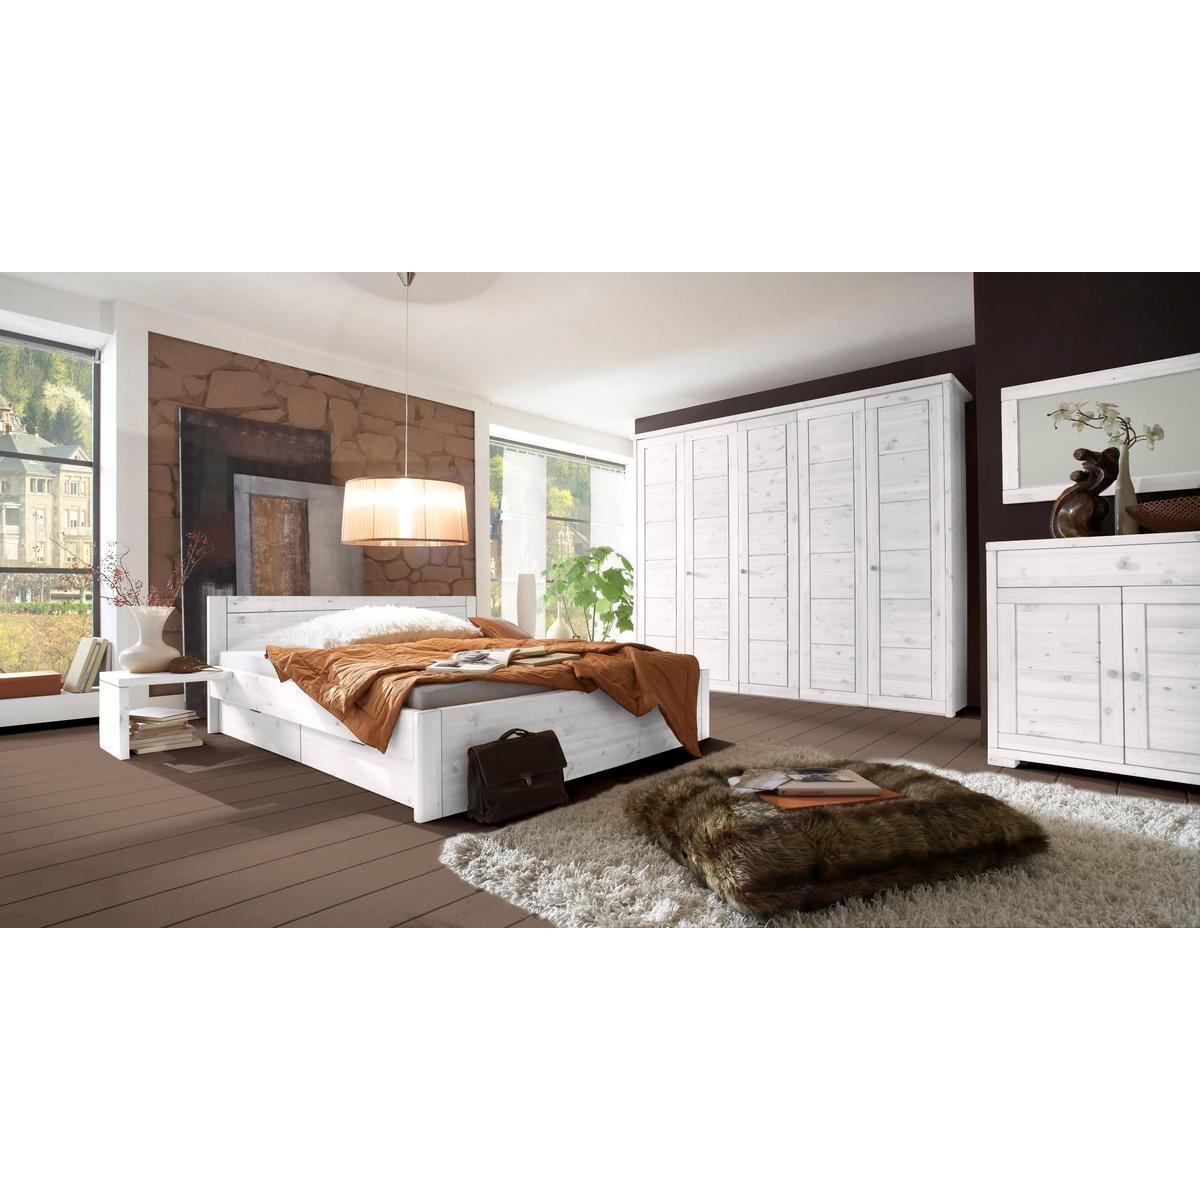 massivholz schubkastenbett weiss kiefer massiv bett mit schubladen. Black Bedroom Furniture Sets. Home Design Ideas